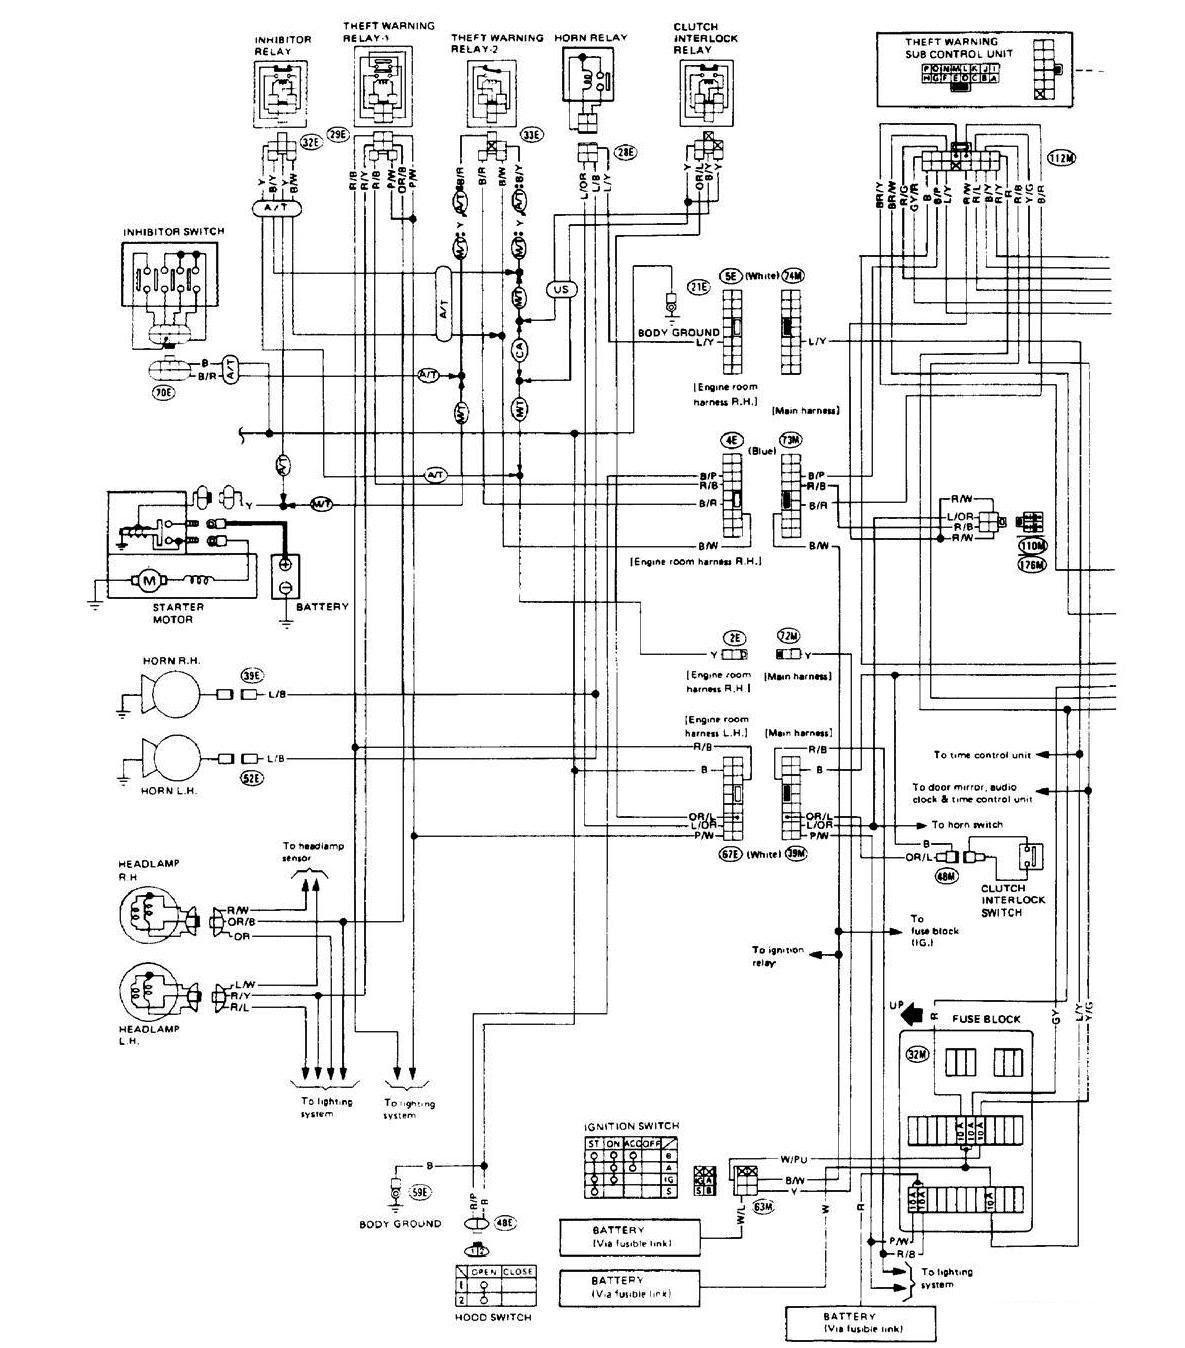 [DIAGRAM] Nissan D21 Wiring Diagram Light FULL Version HD ...